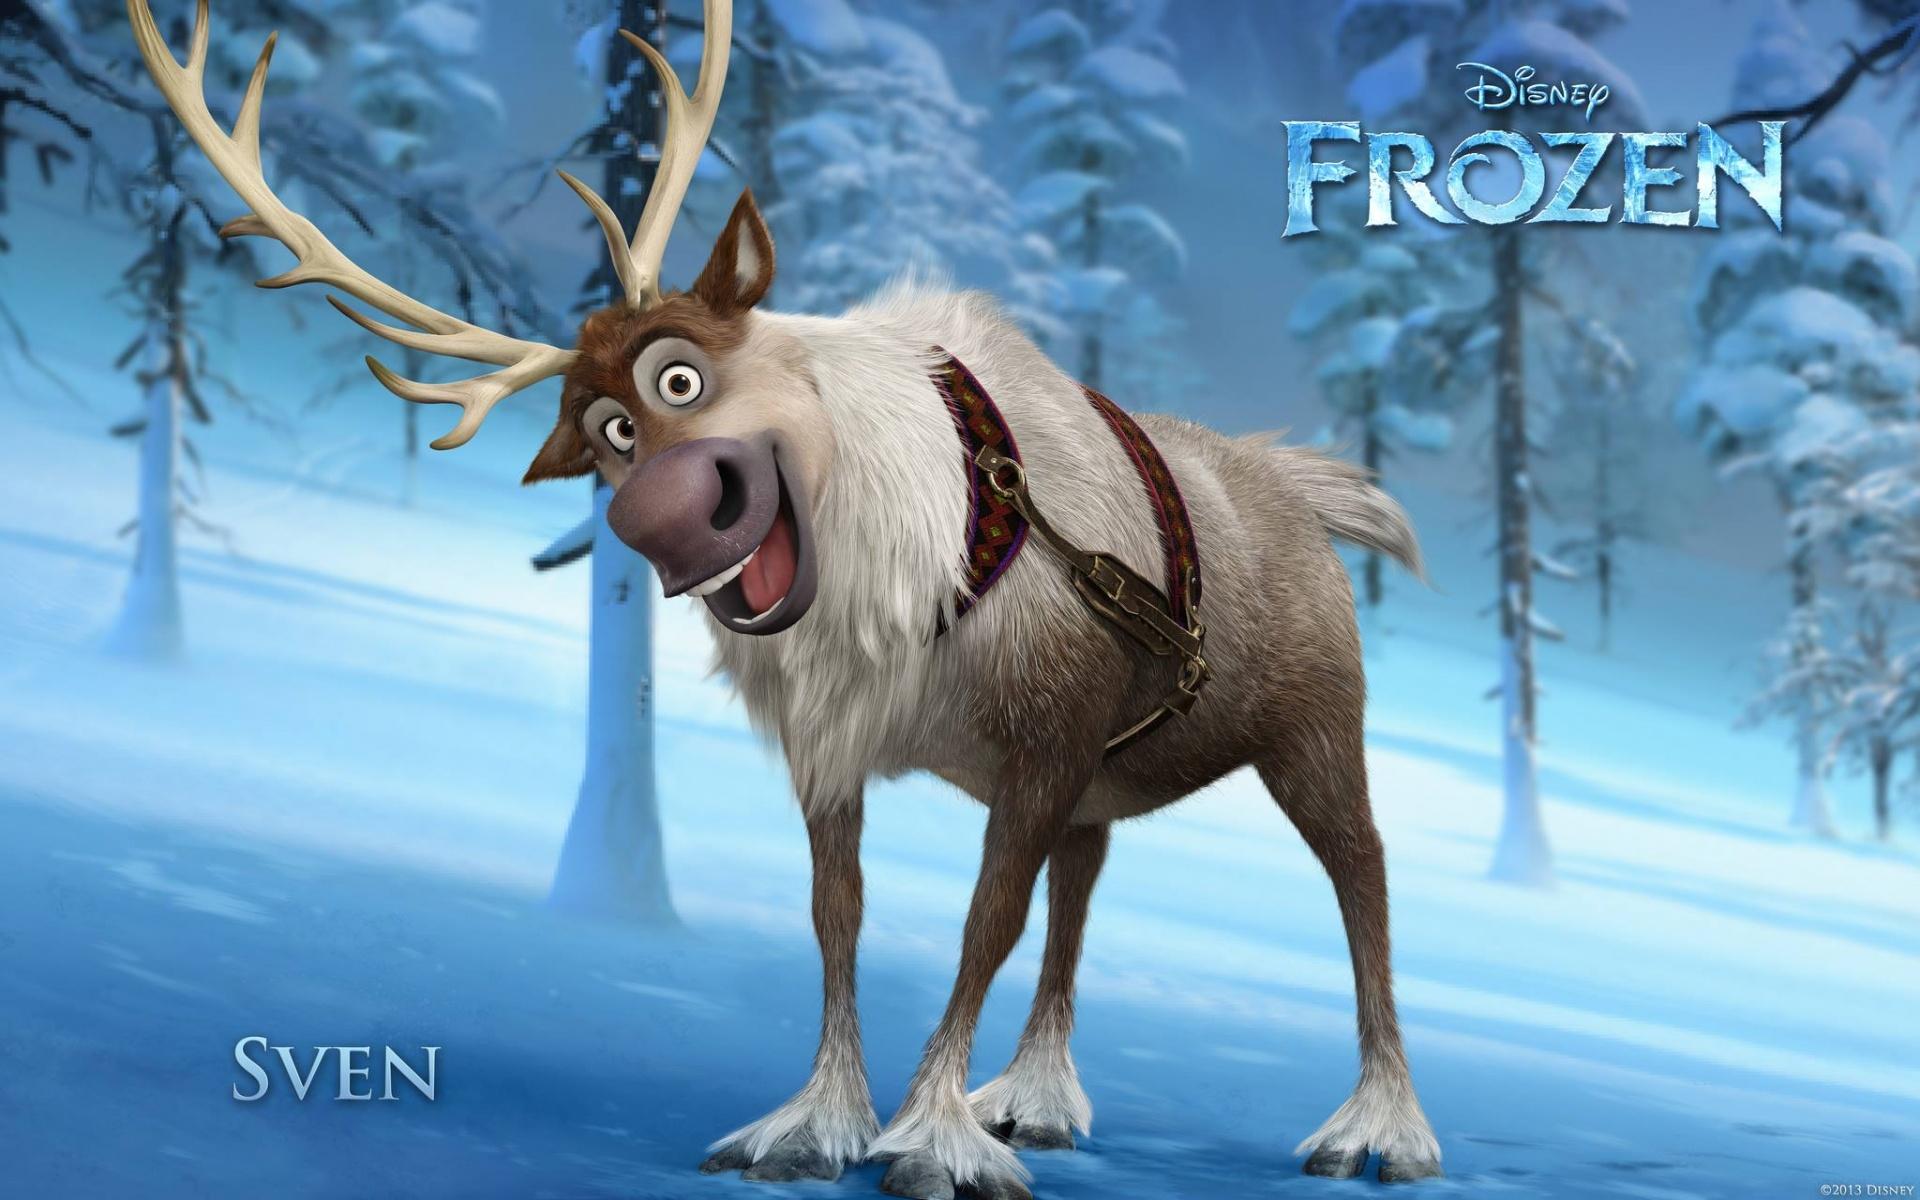 Disney Frozen 2013 Sven Click To View